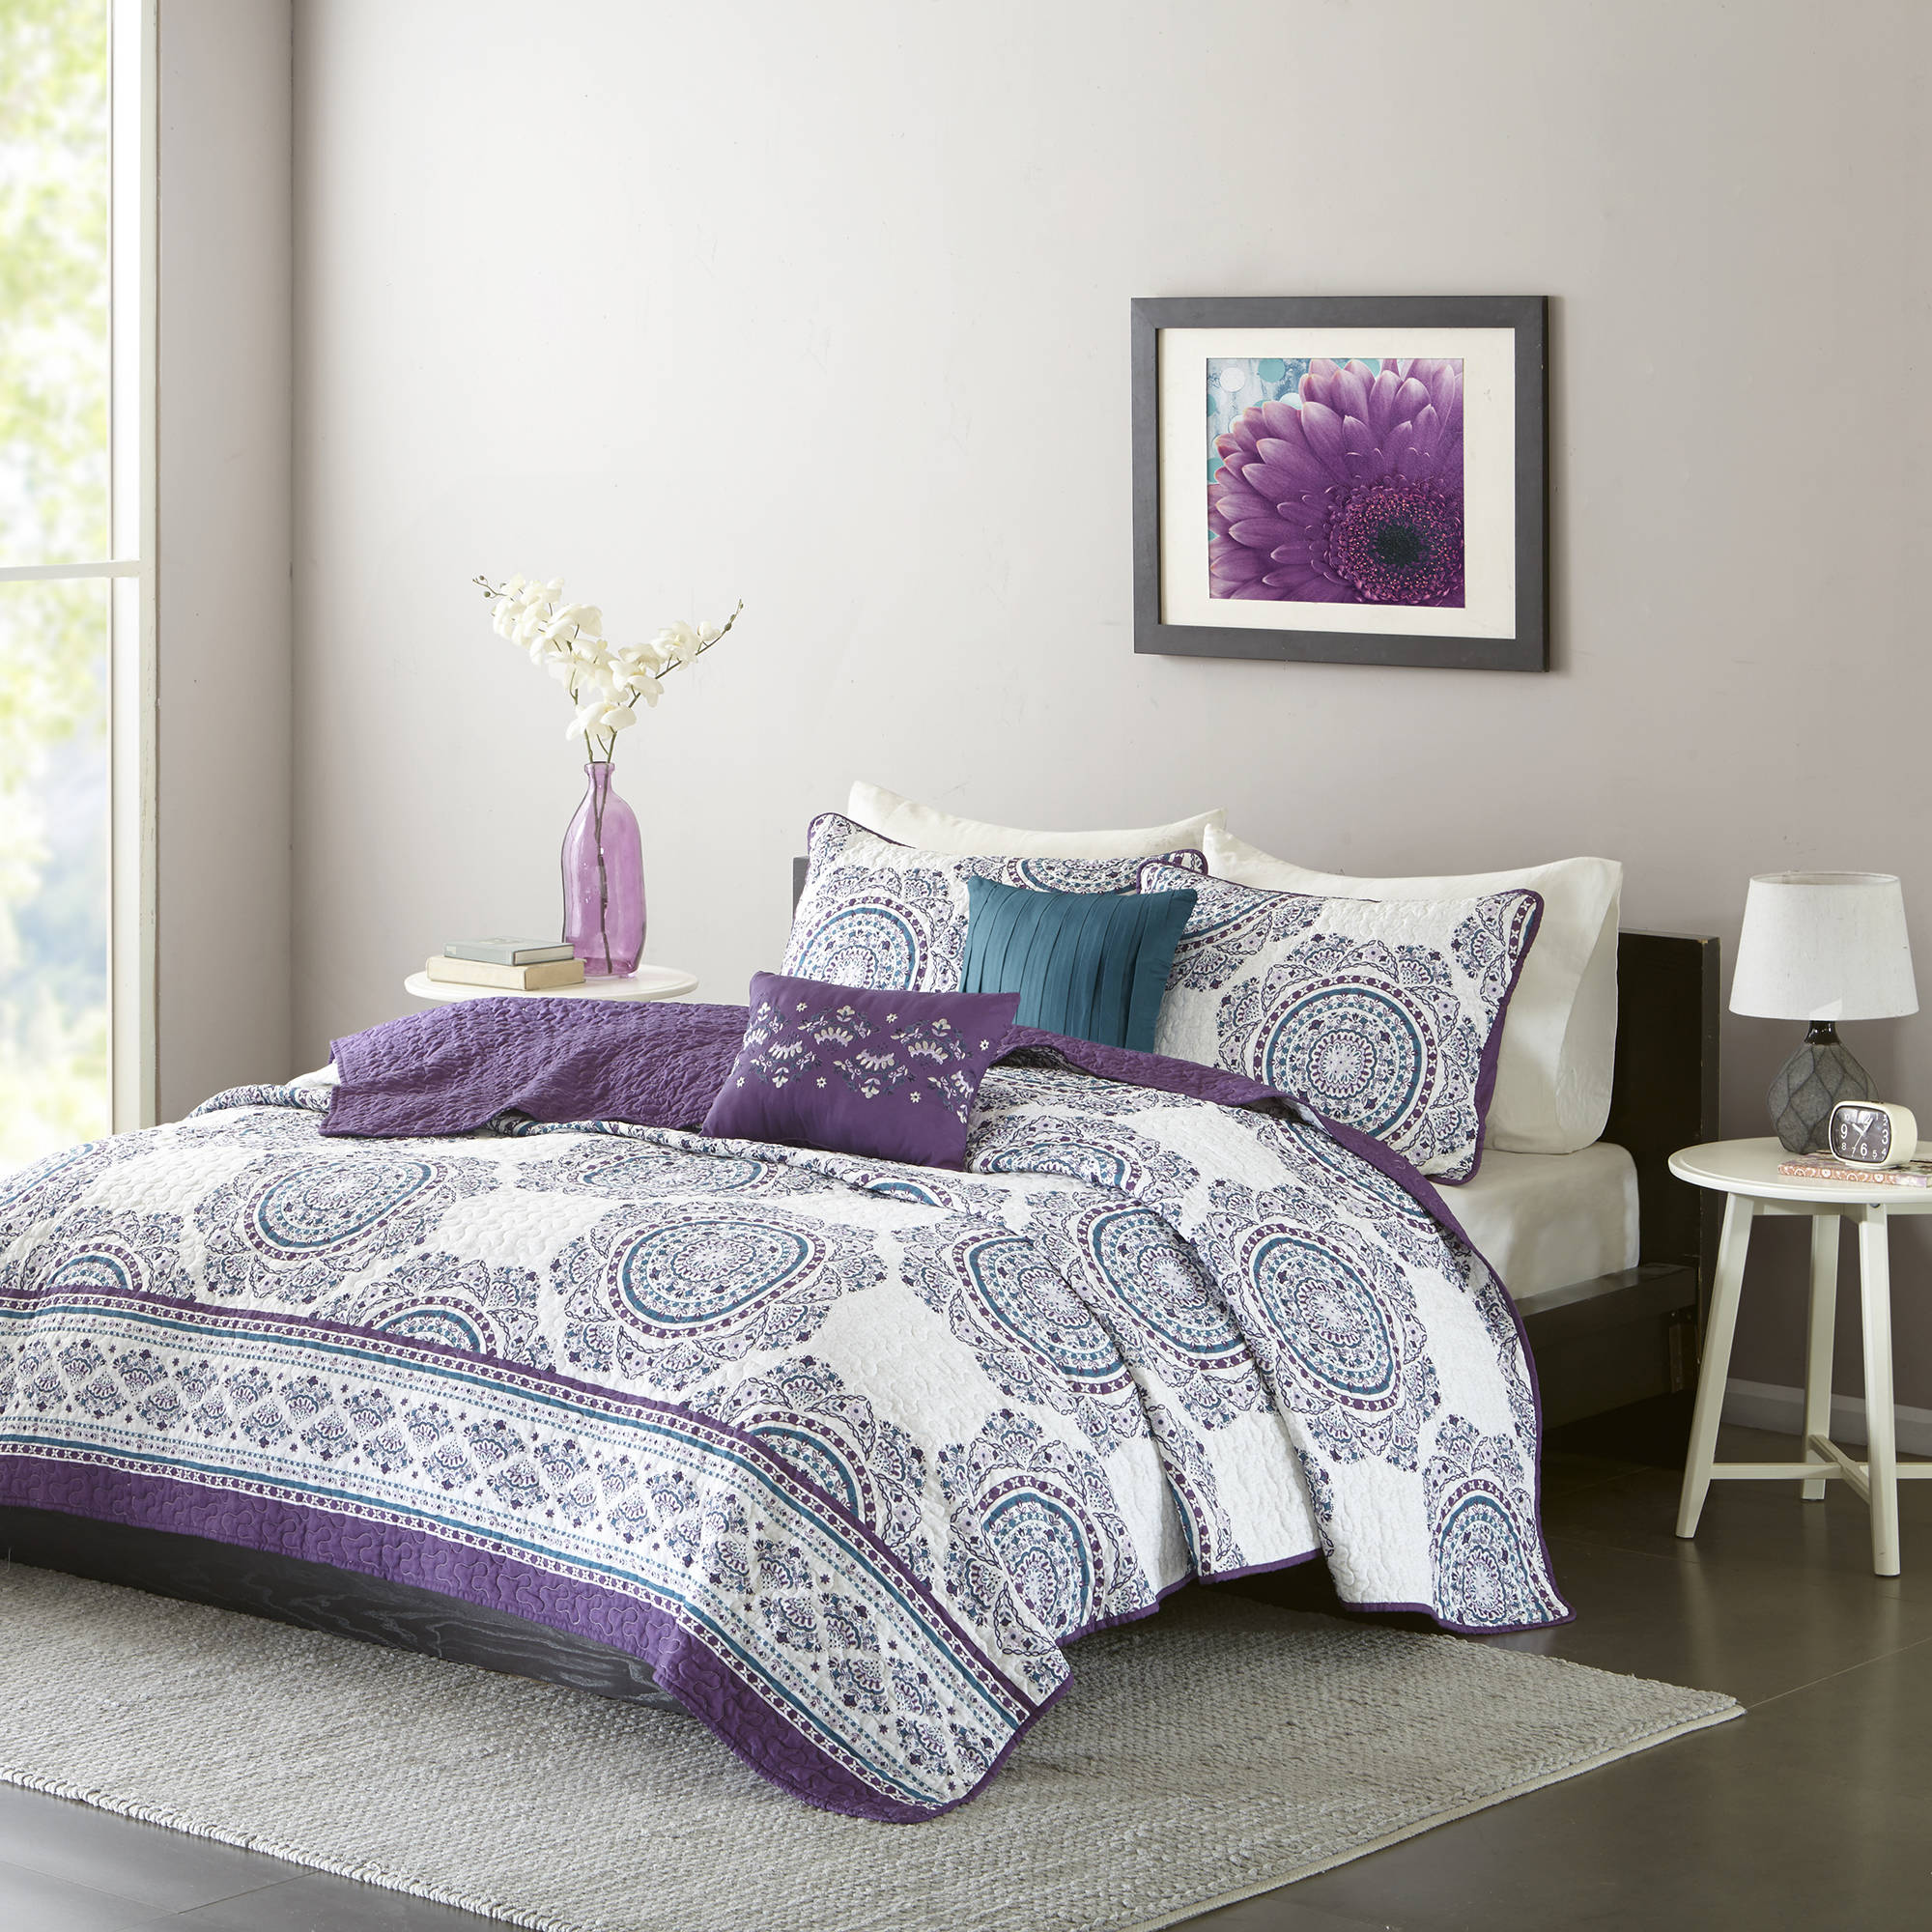 Home Essence Apartment Camryn Bedding Coverlet Set